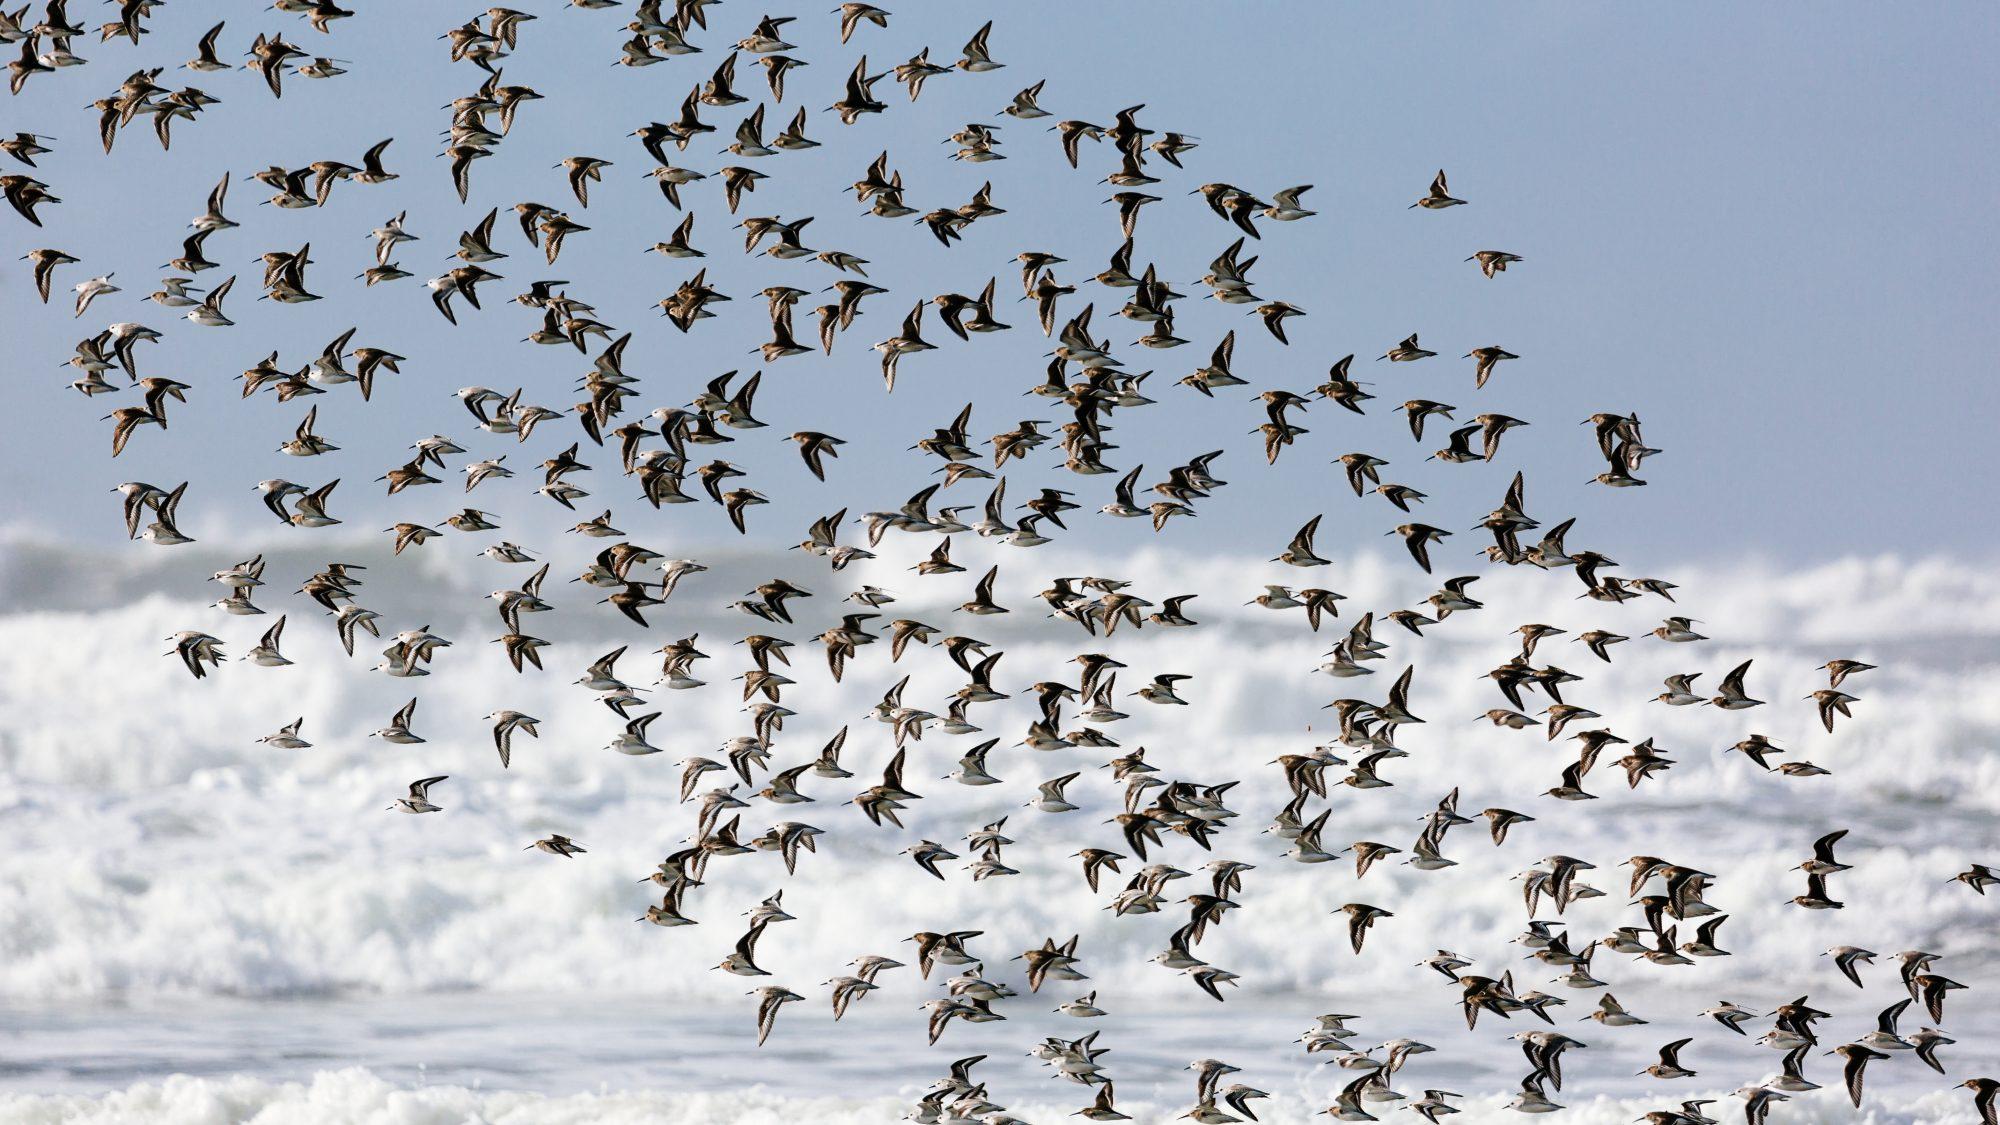 Flock of birds taking flight on Oregon Coast